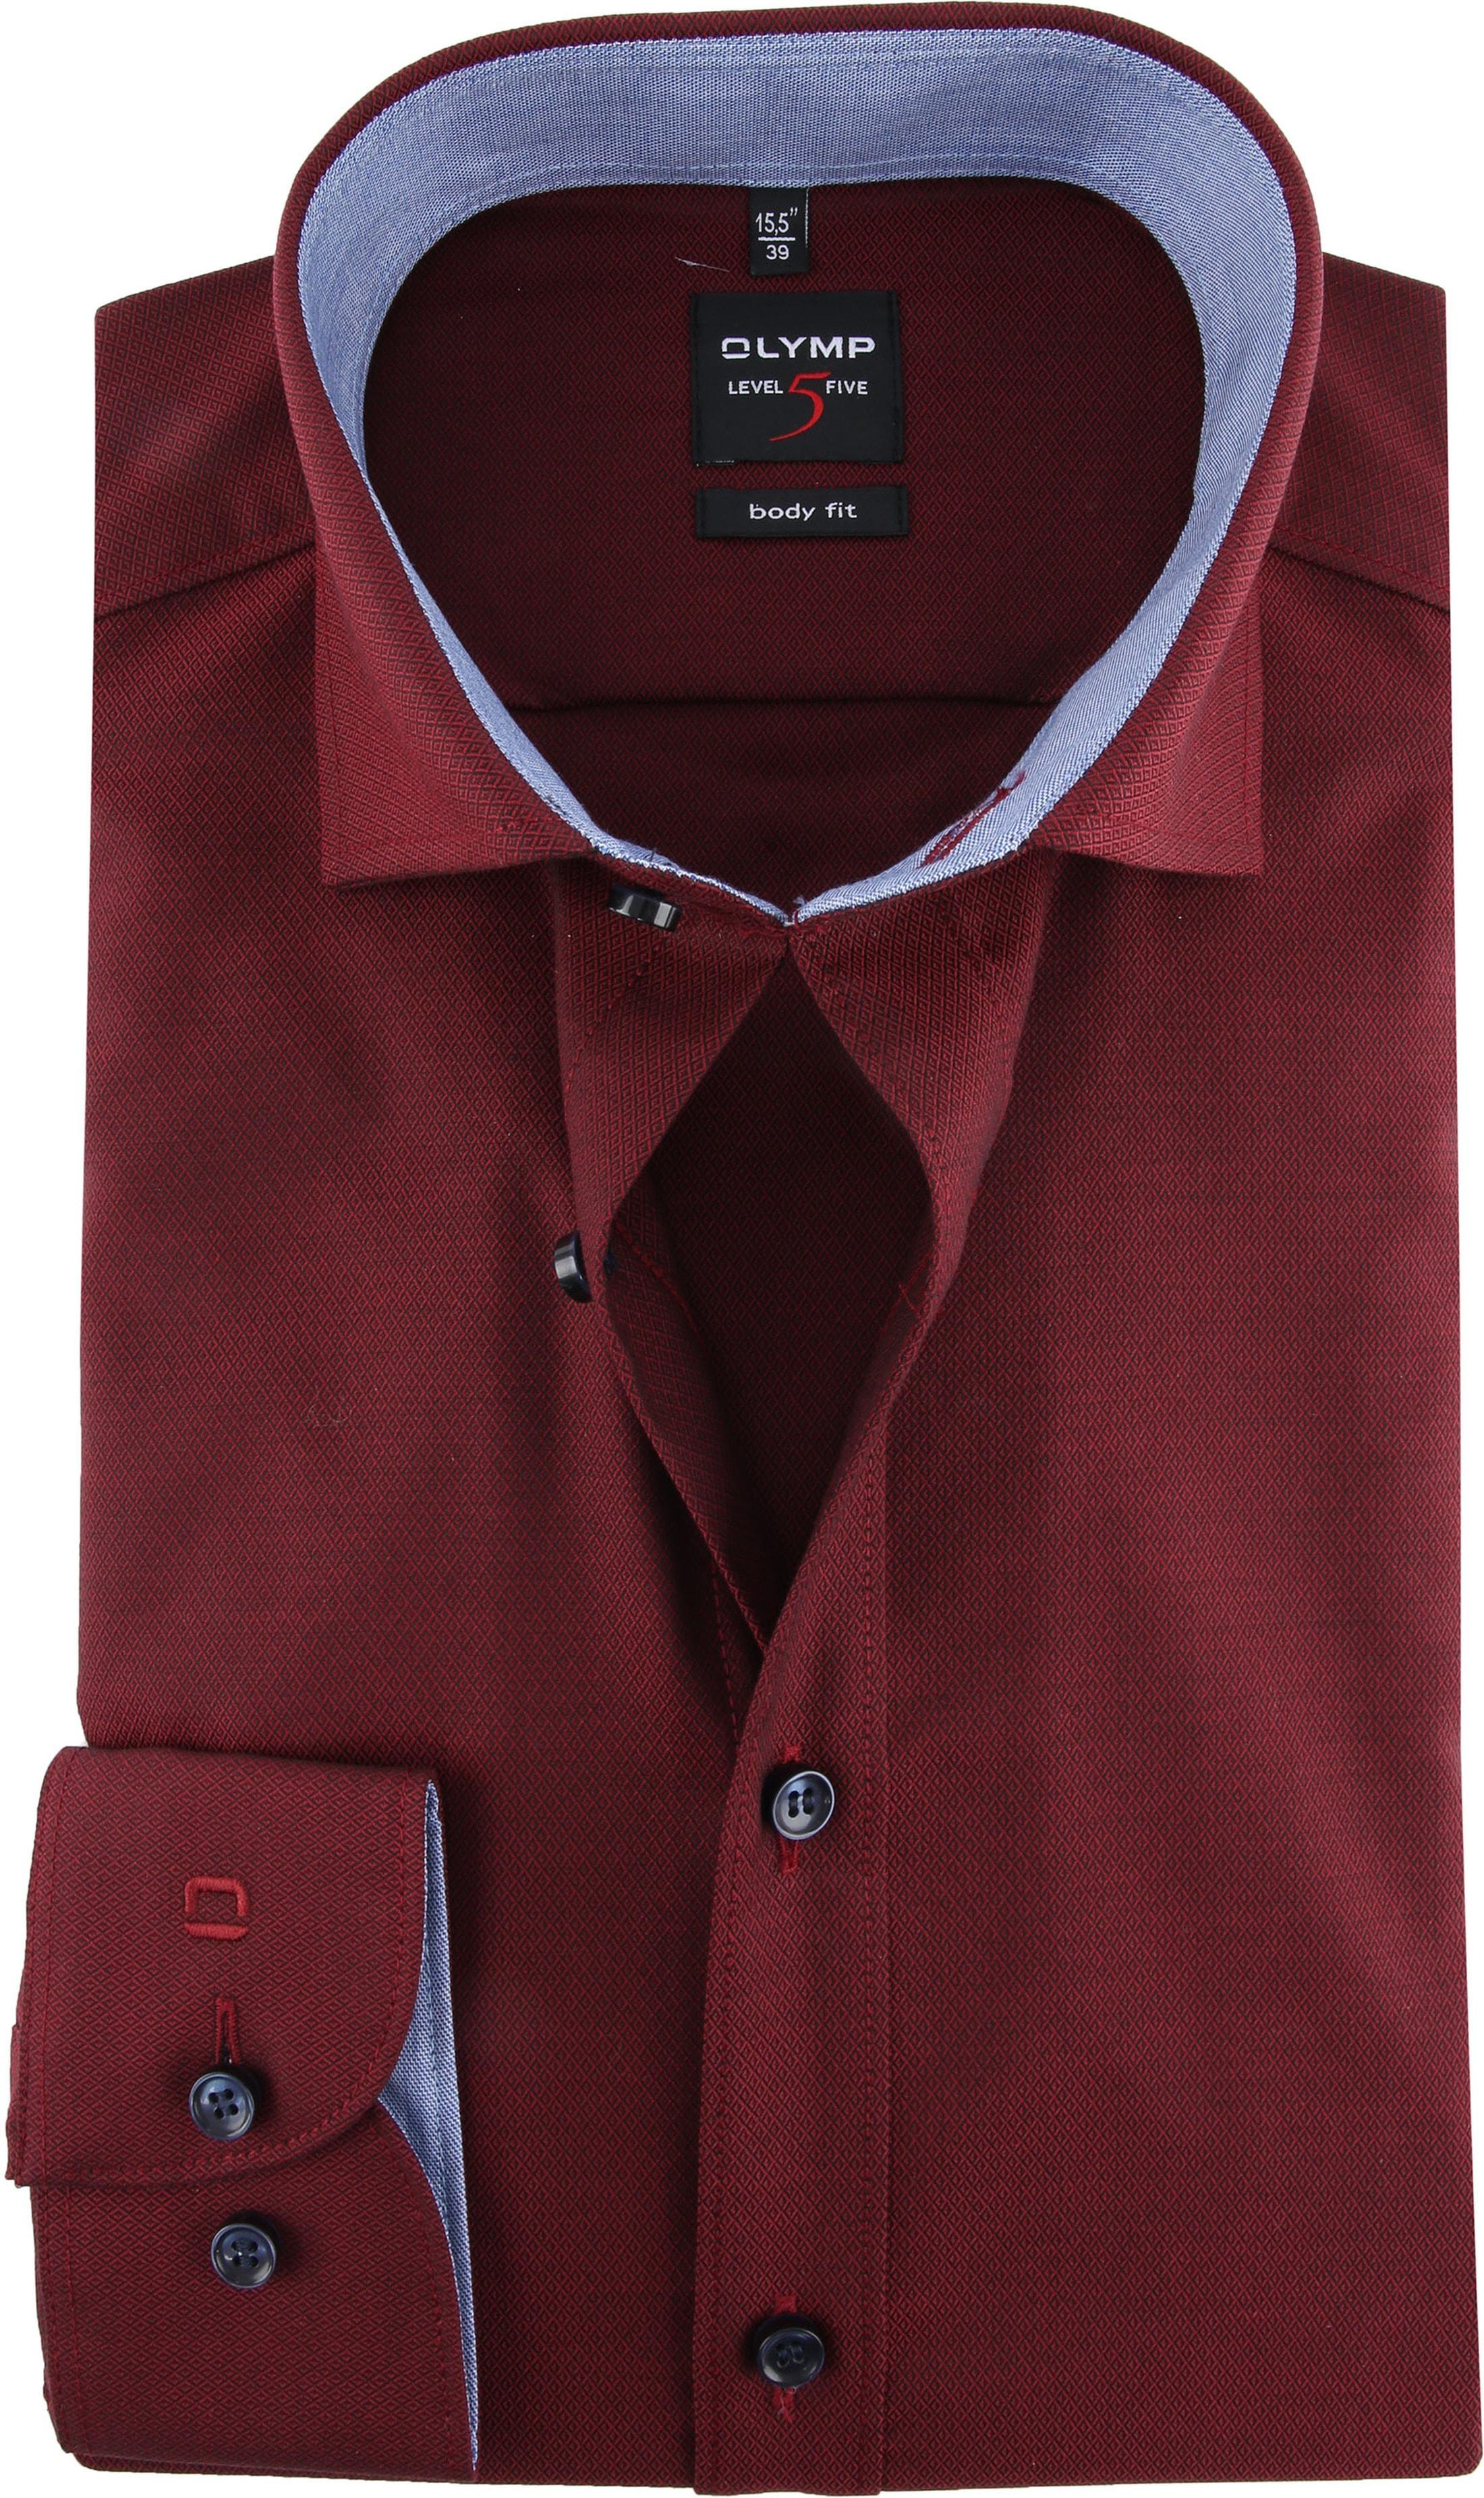 OLYMP Shirt Level 5 Blue Dark Red photo 0